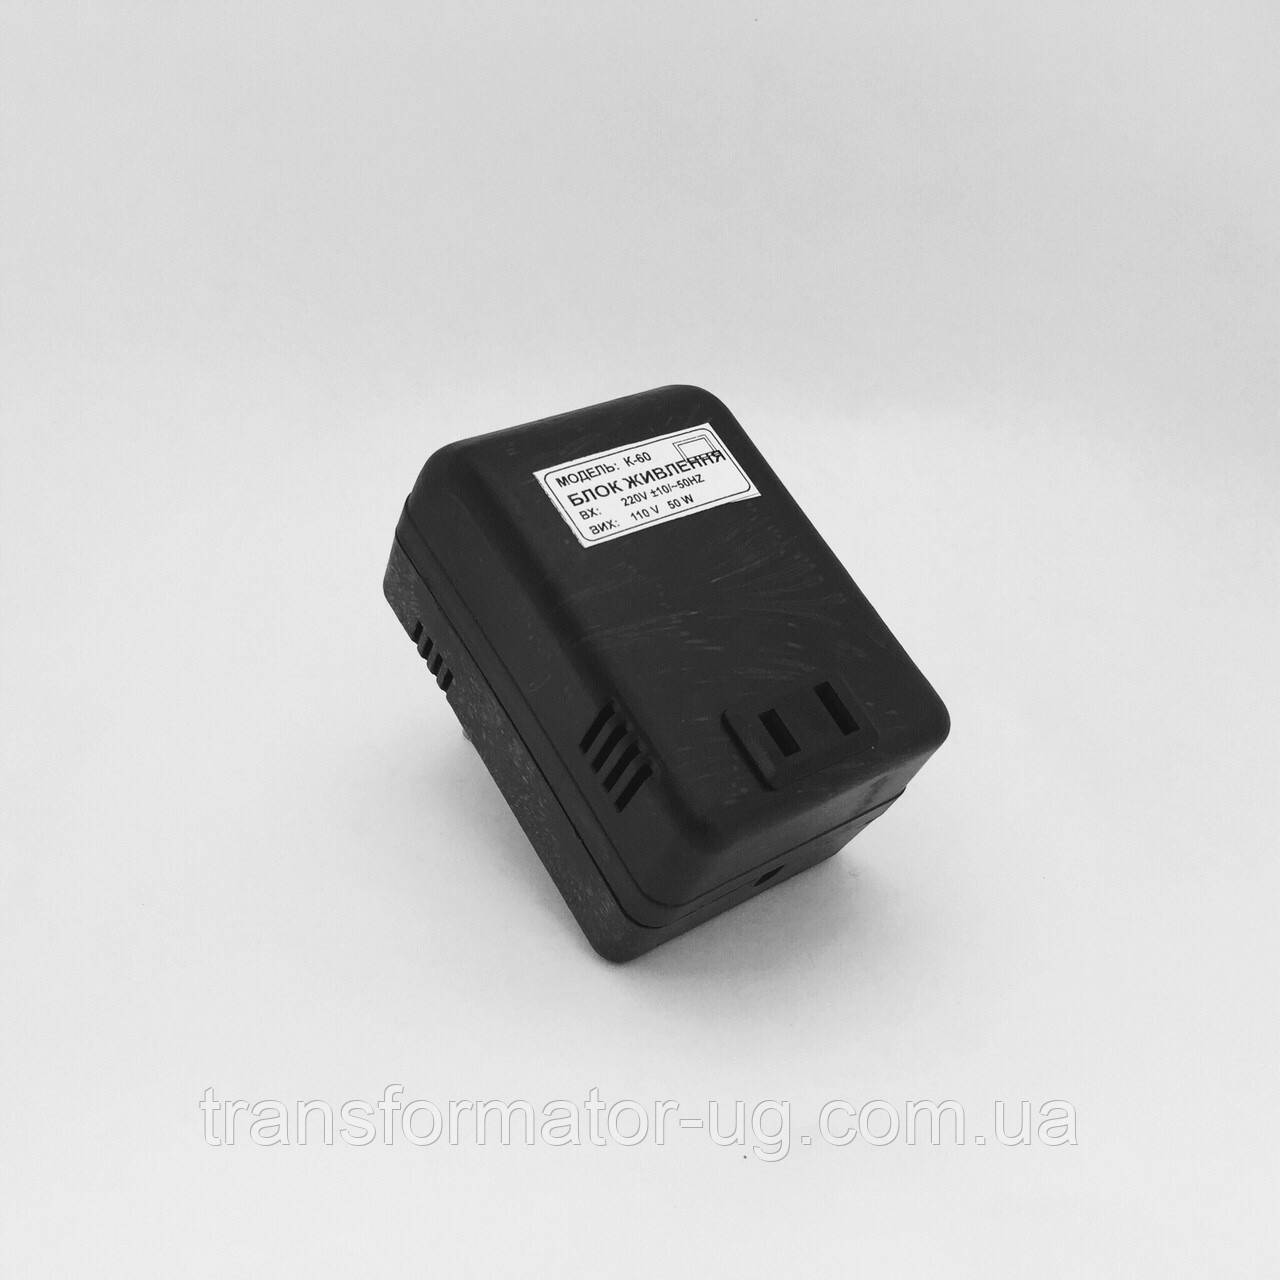 Преобразователь с 220v на 110v-120v 50w